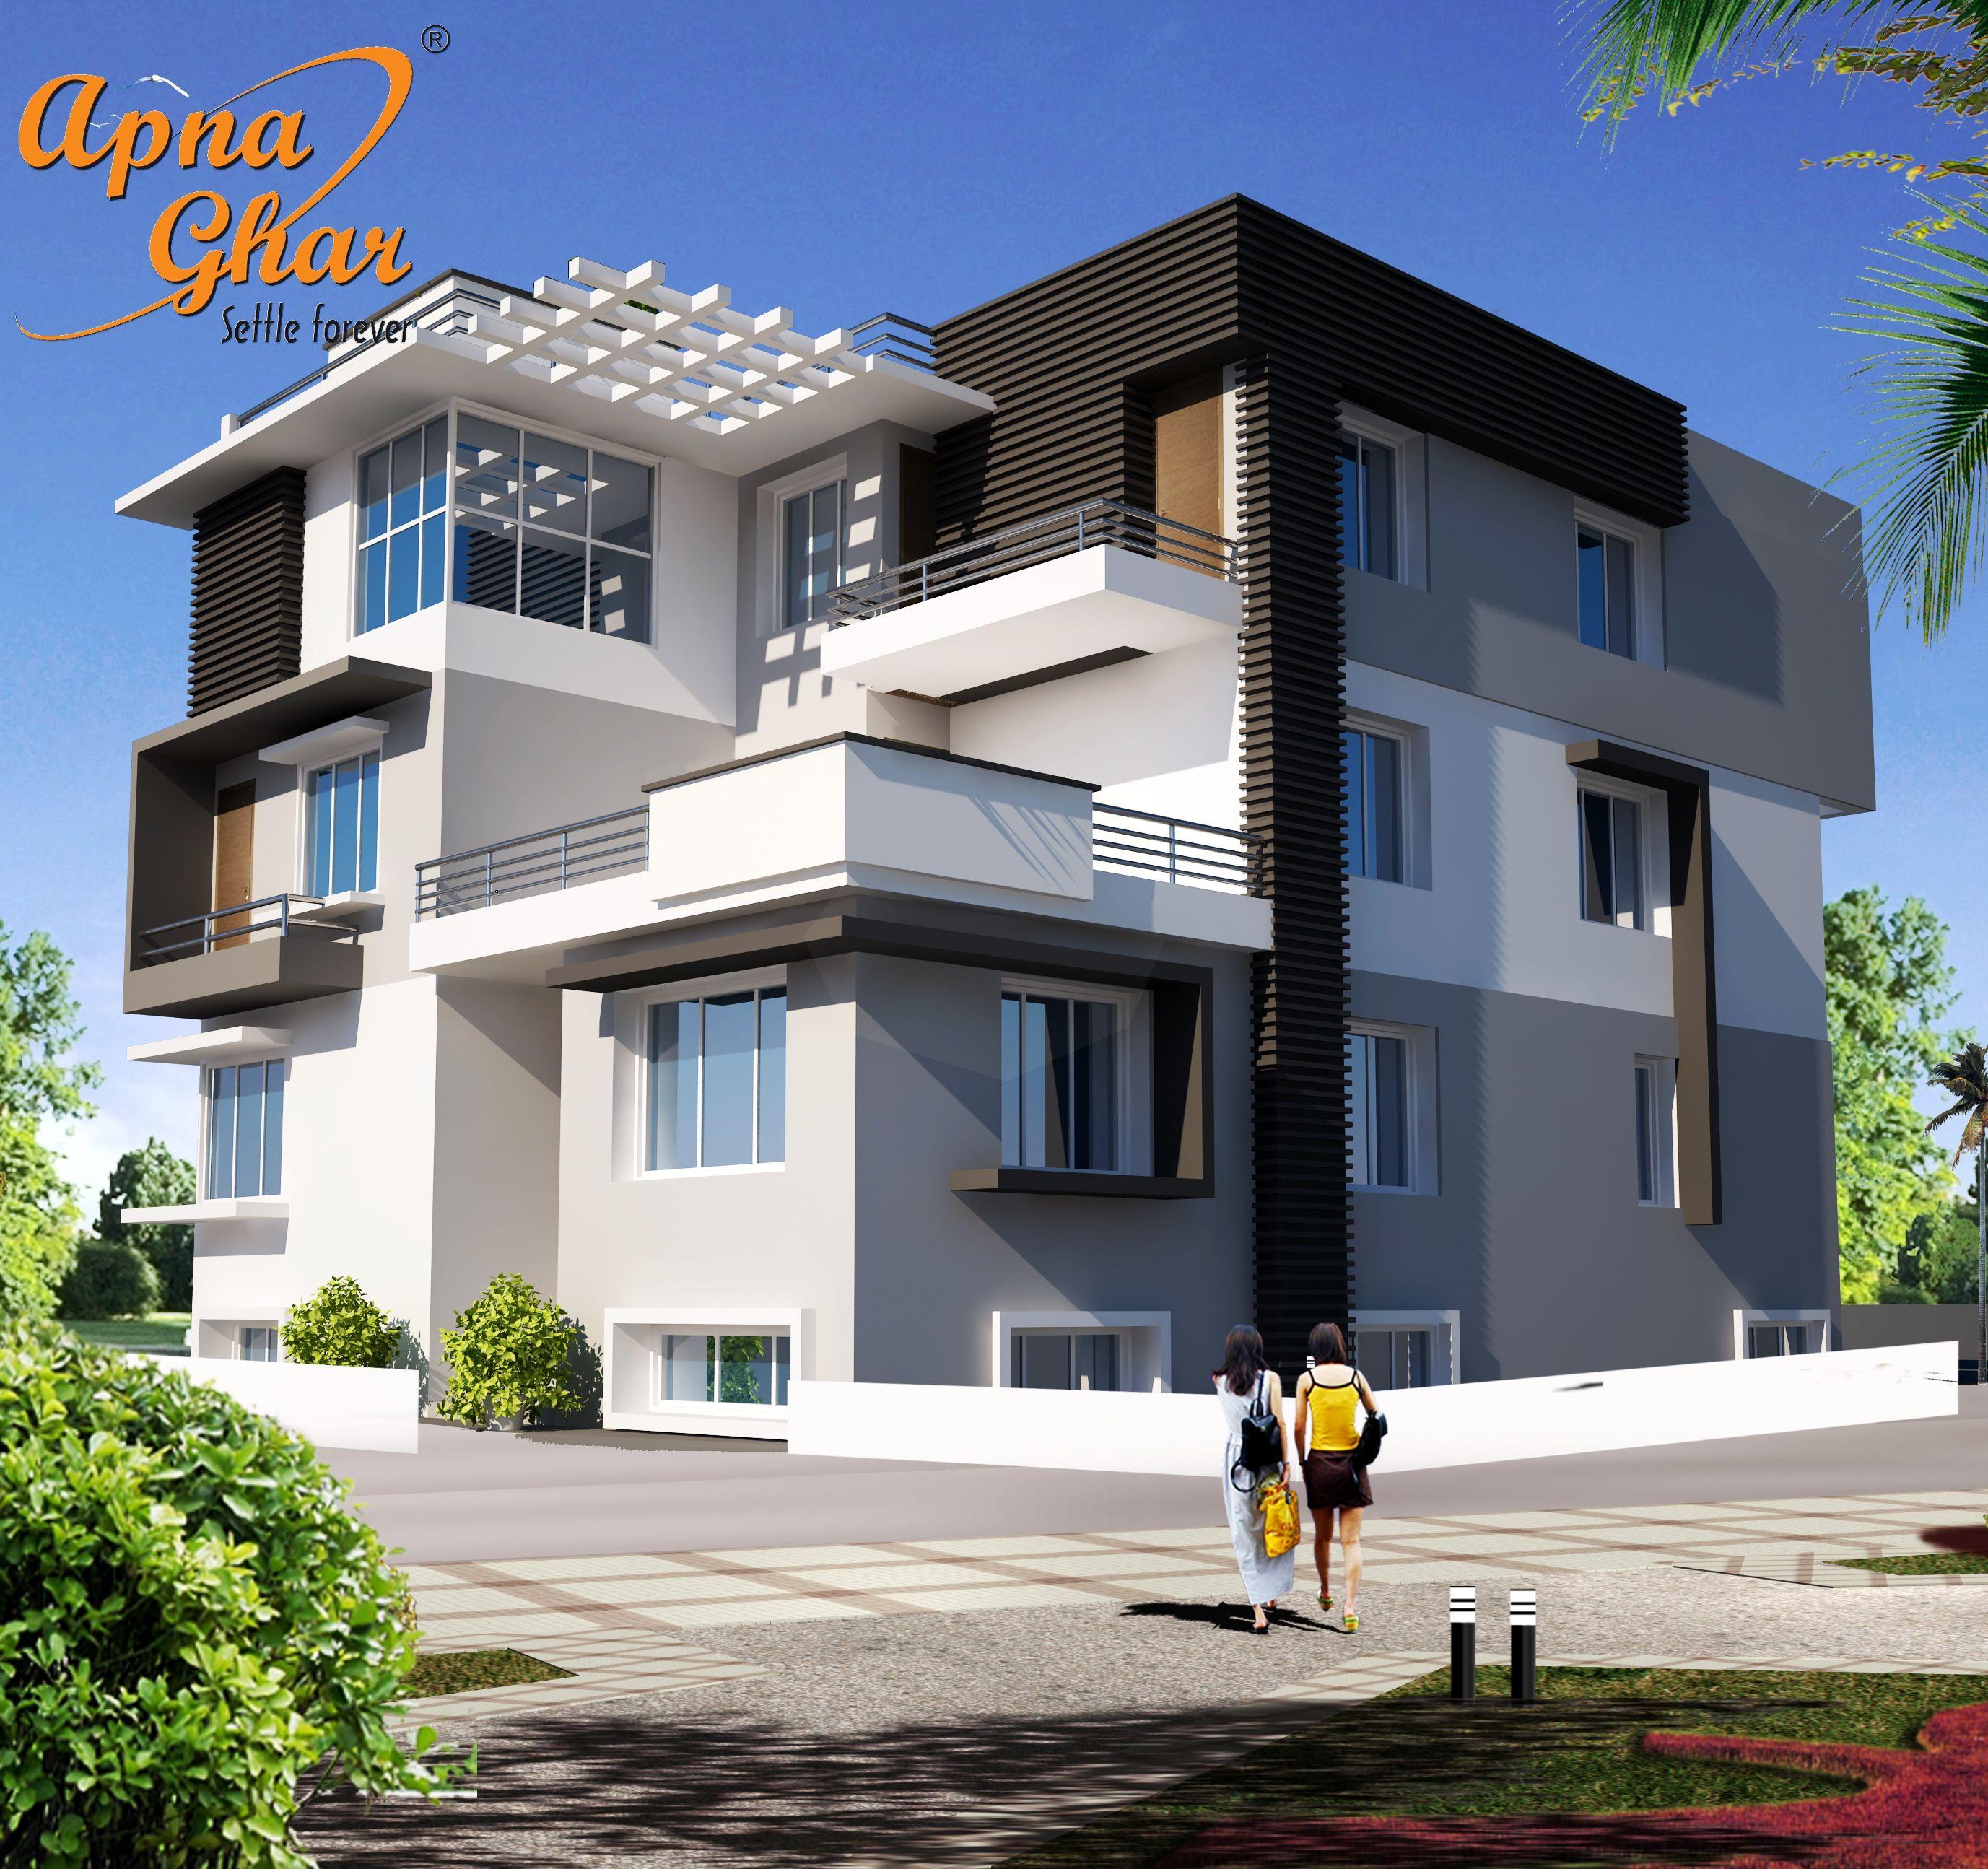 Apnaghar House Design: Pin By Apnaghar On Apanghar House Designs